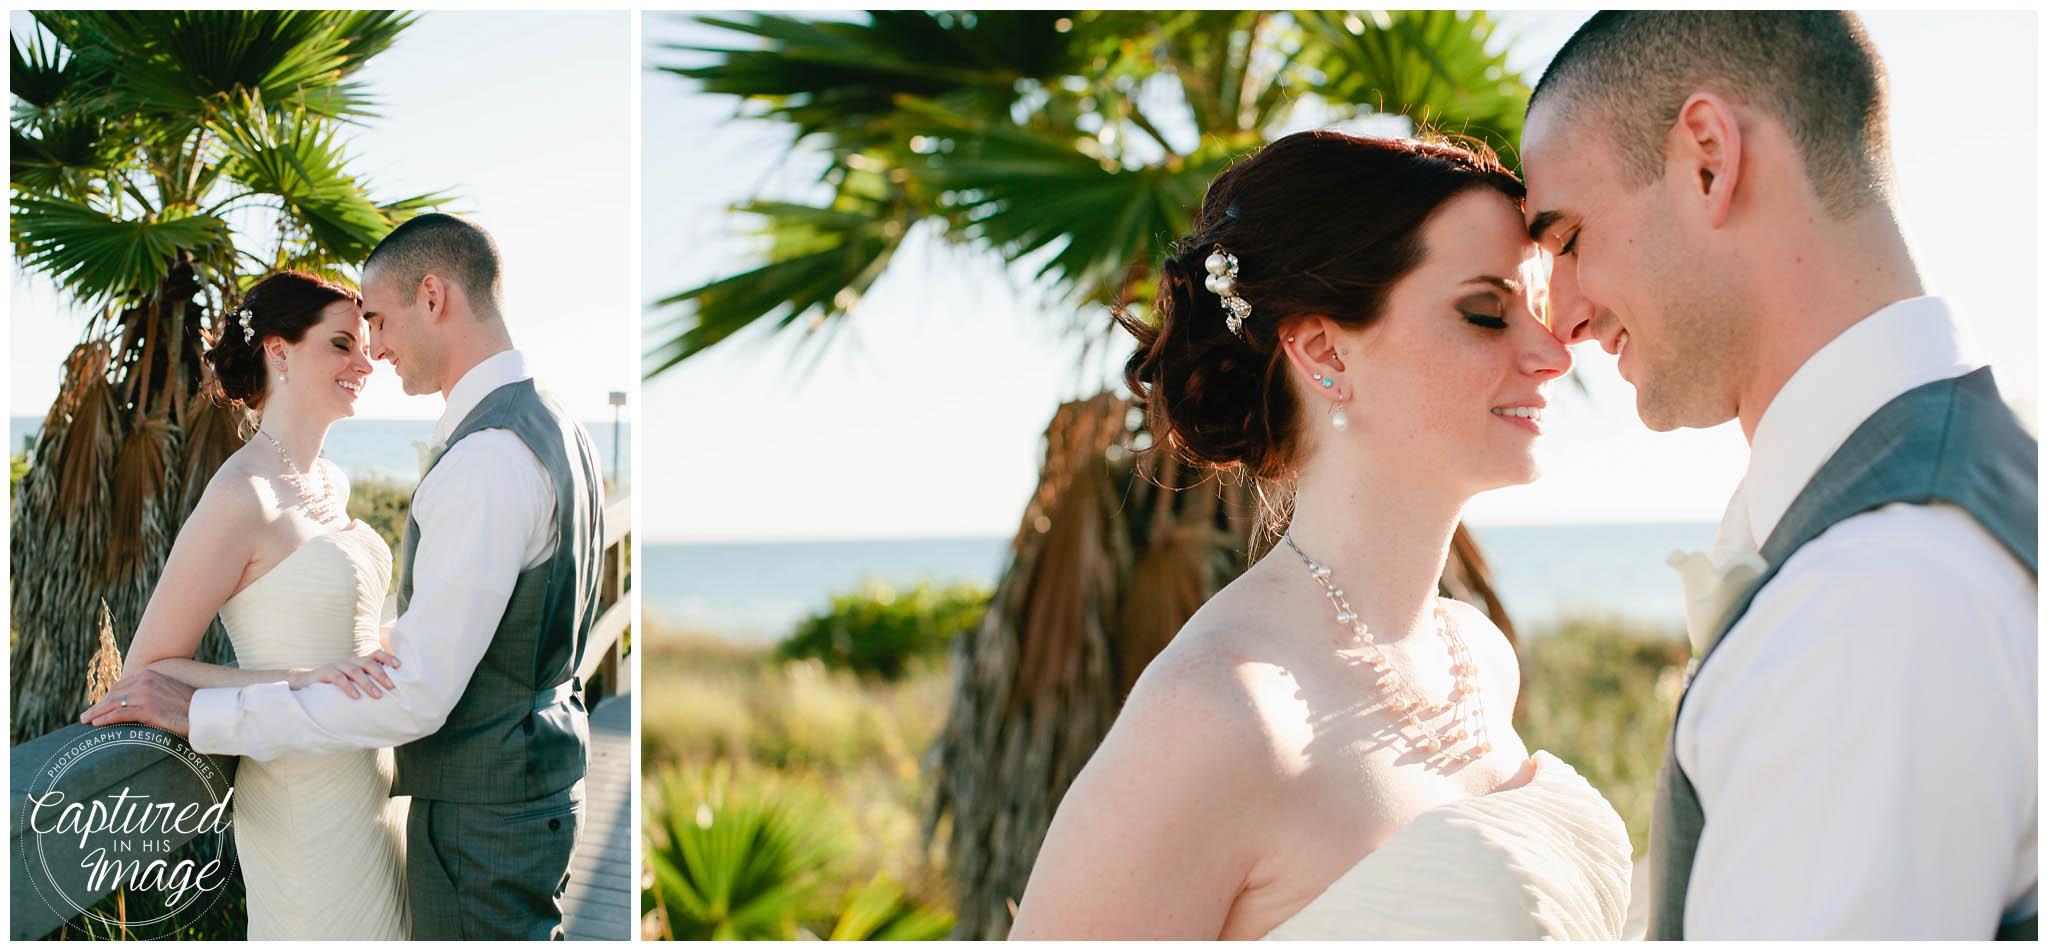 St. Pete Beach Destination Wedding (36 of 81)